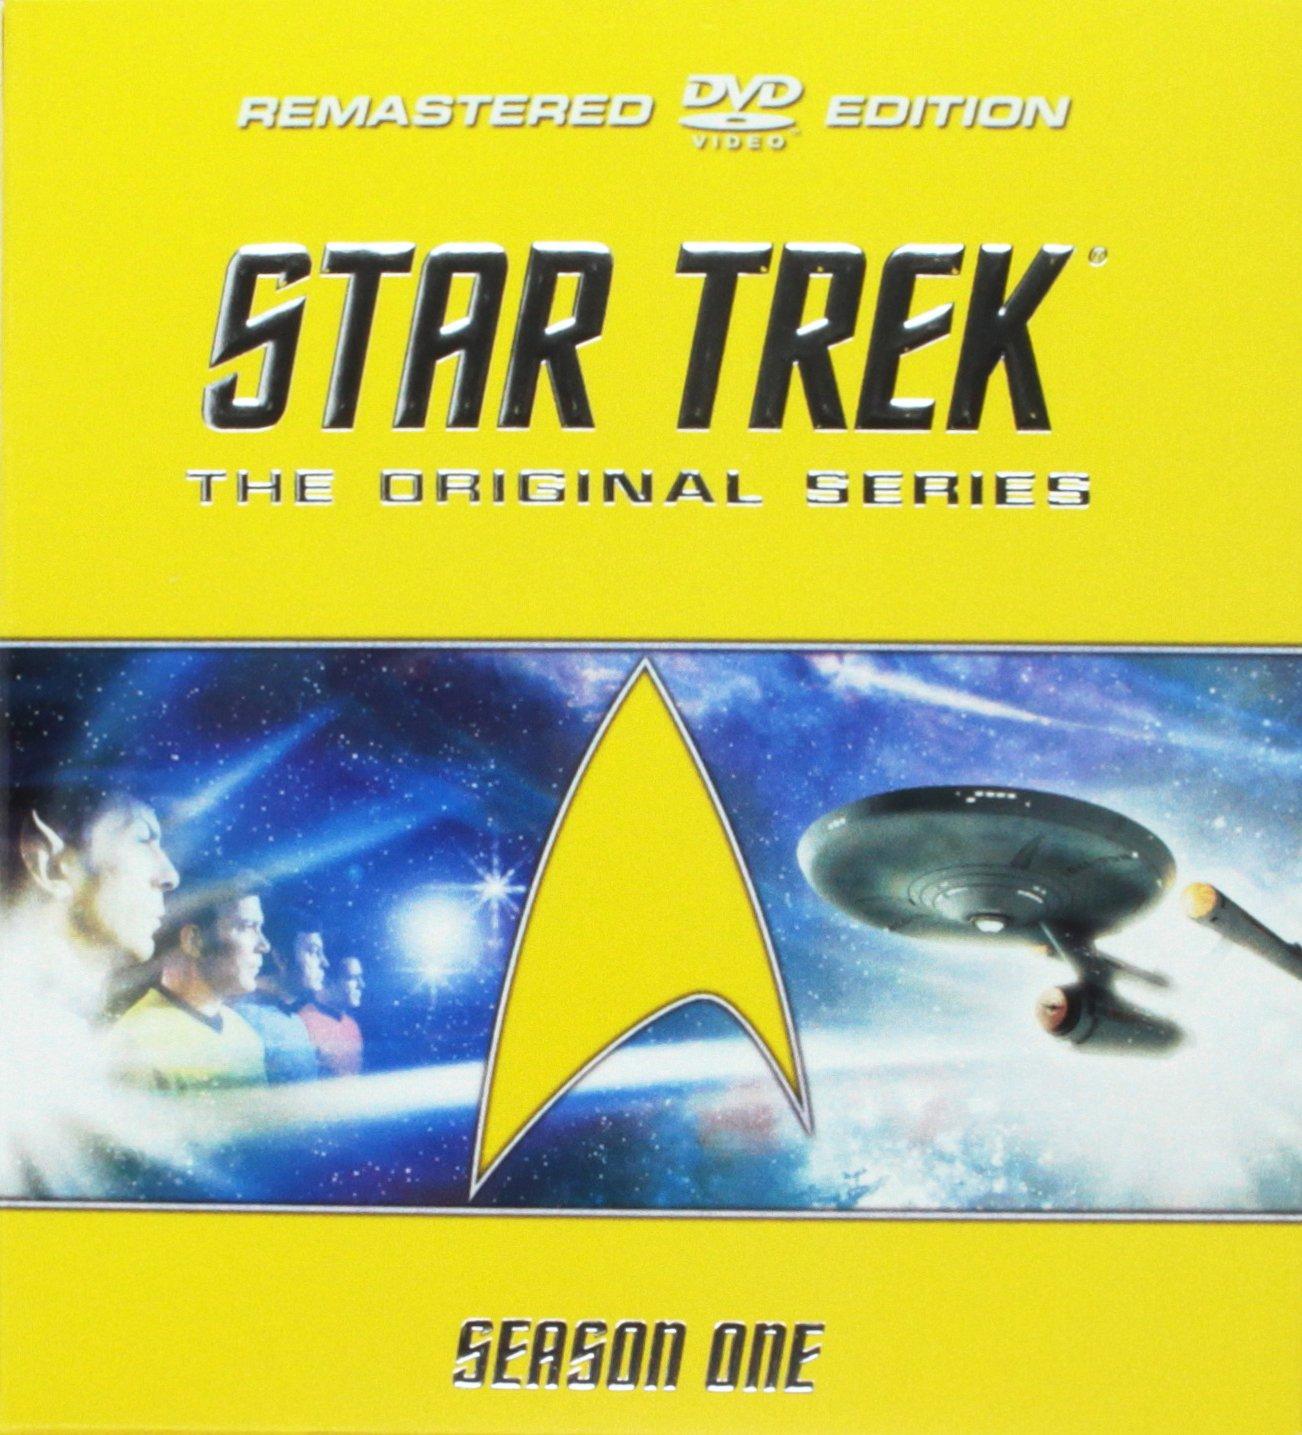 Star Trek: The Original Series - Season 1 (Remastered) DVD